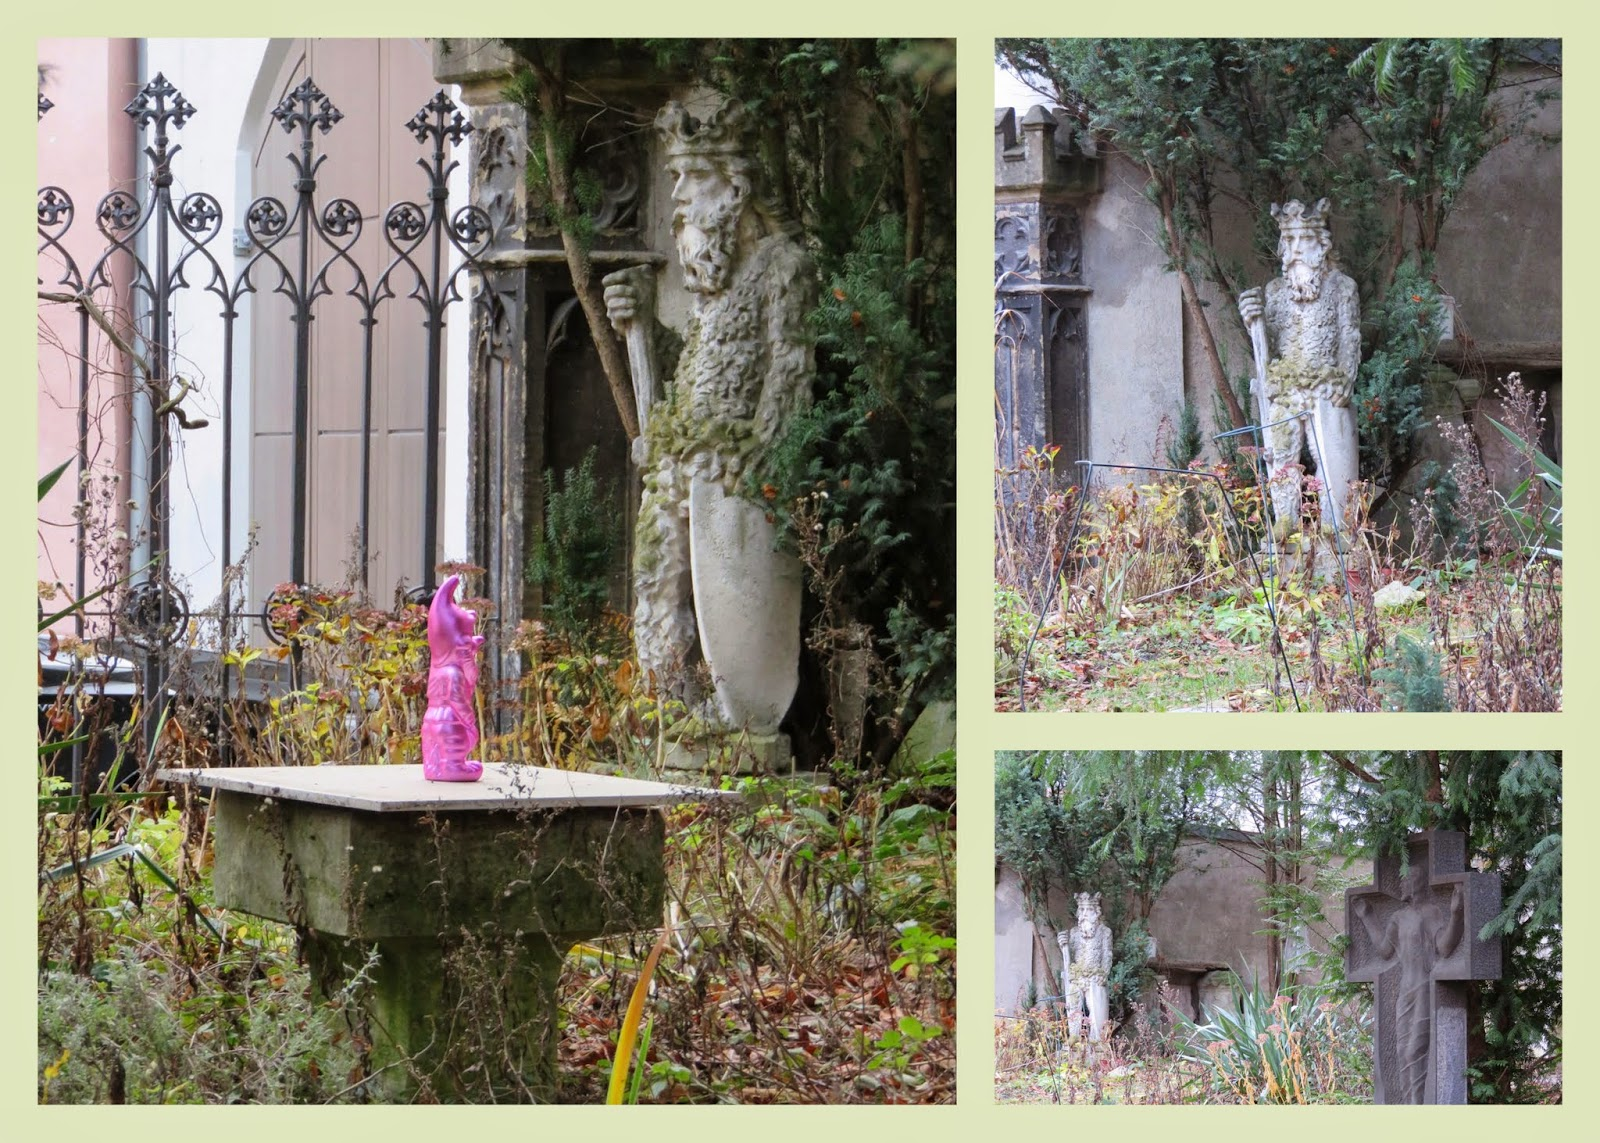 Hot pink gnome in Regensburg